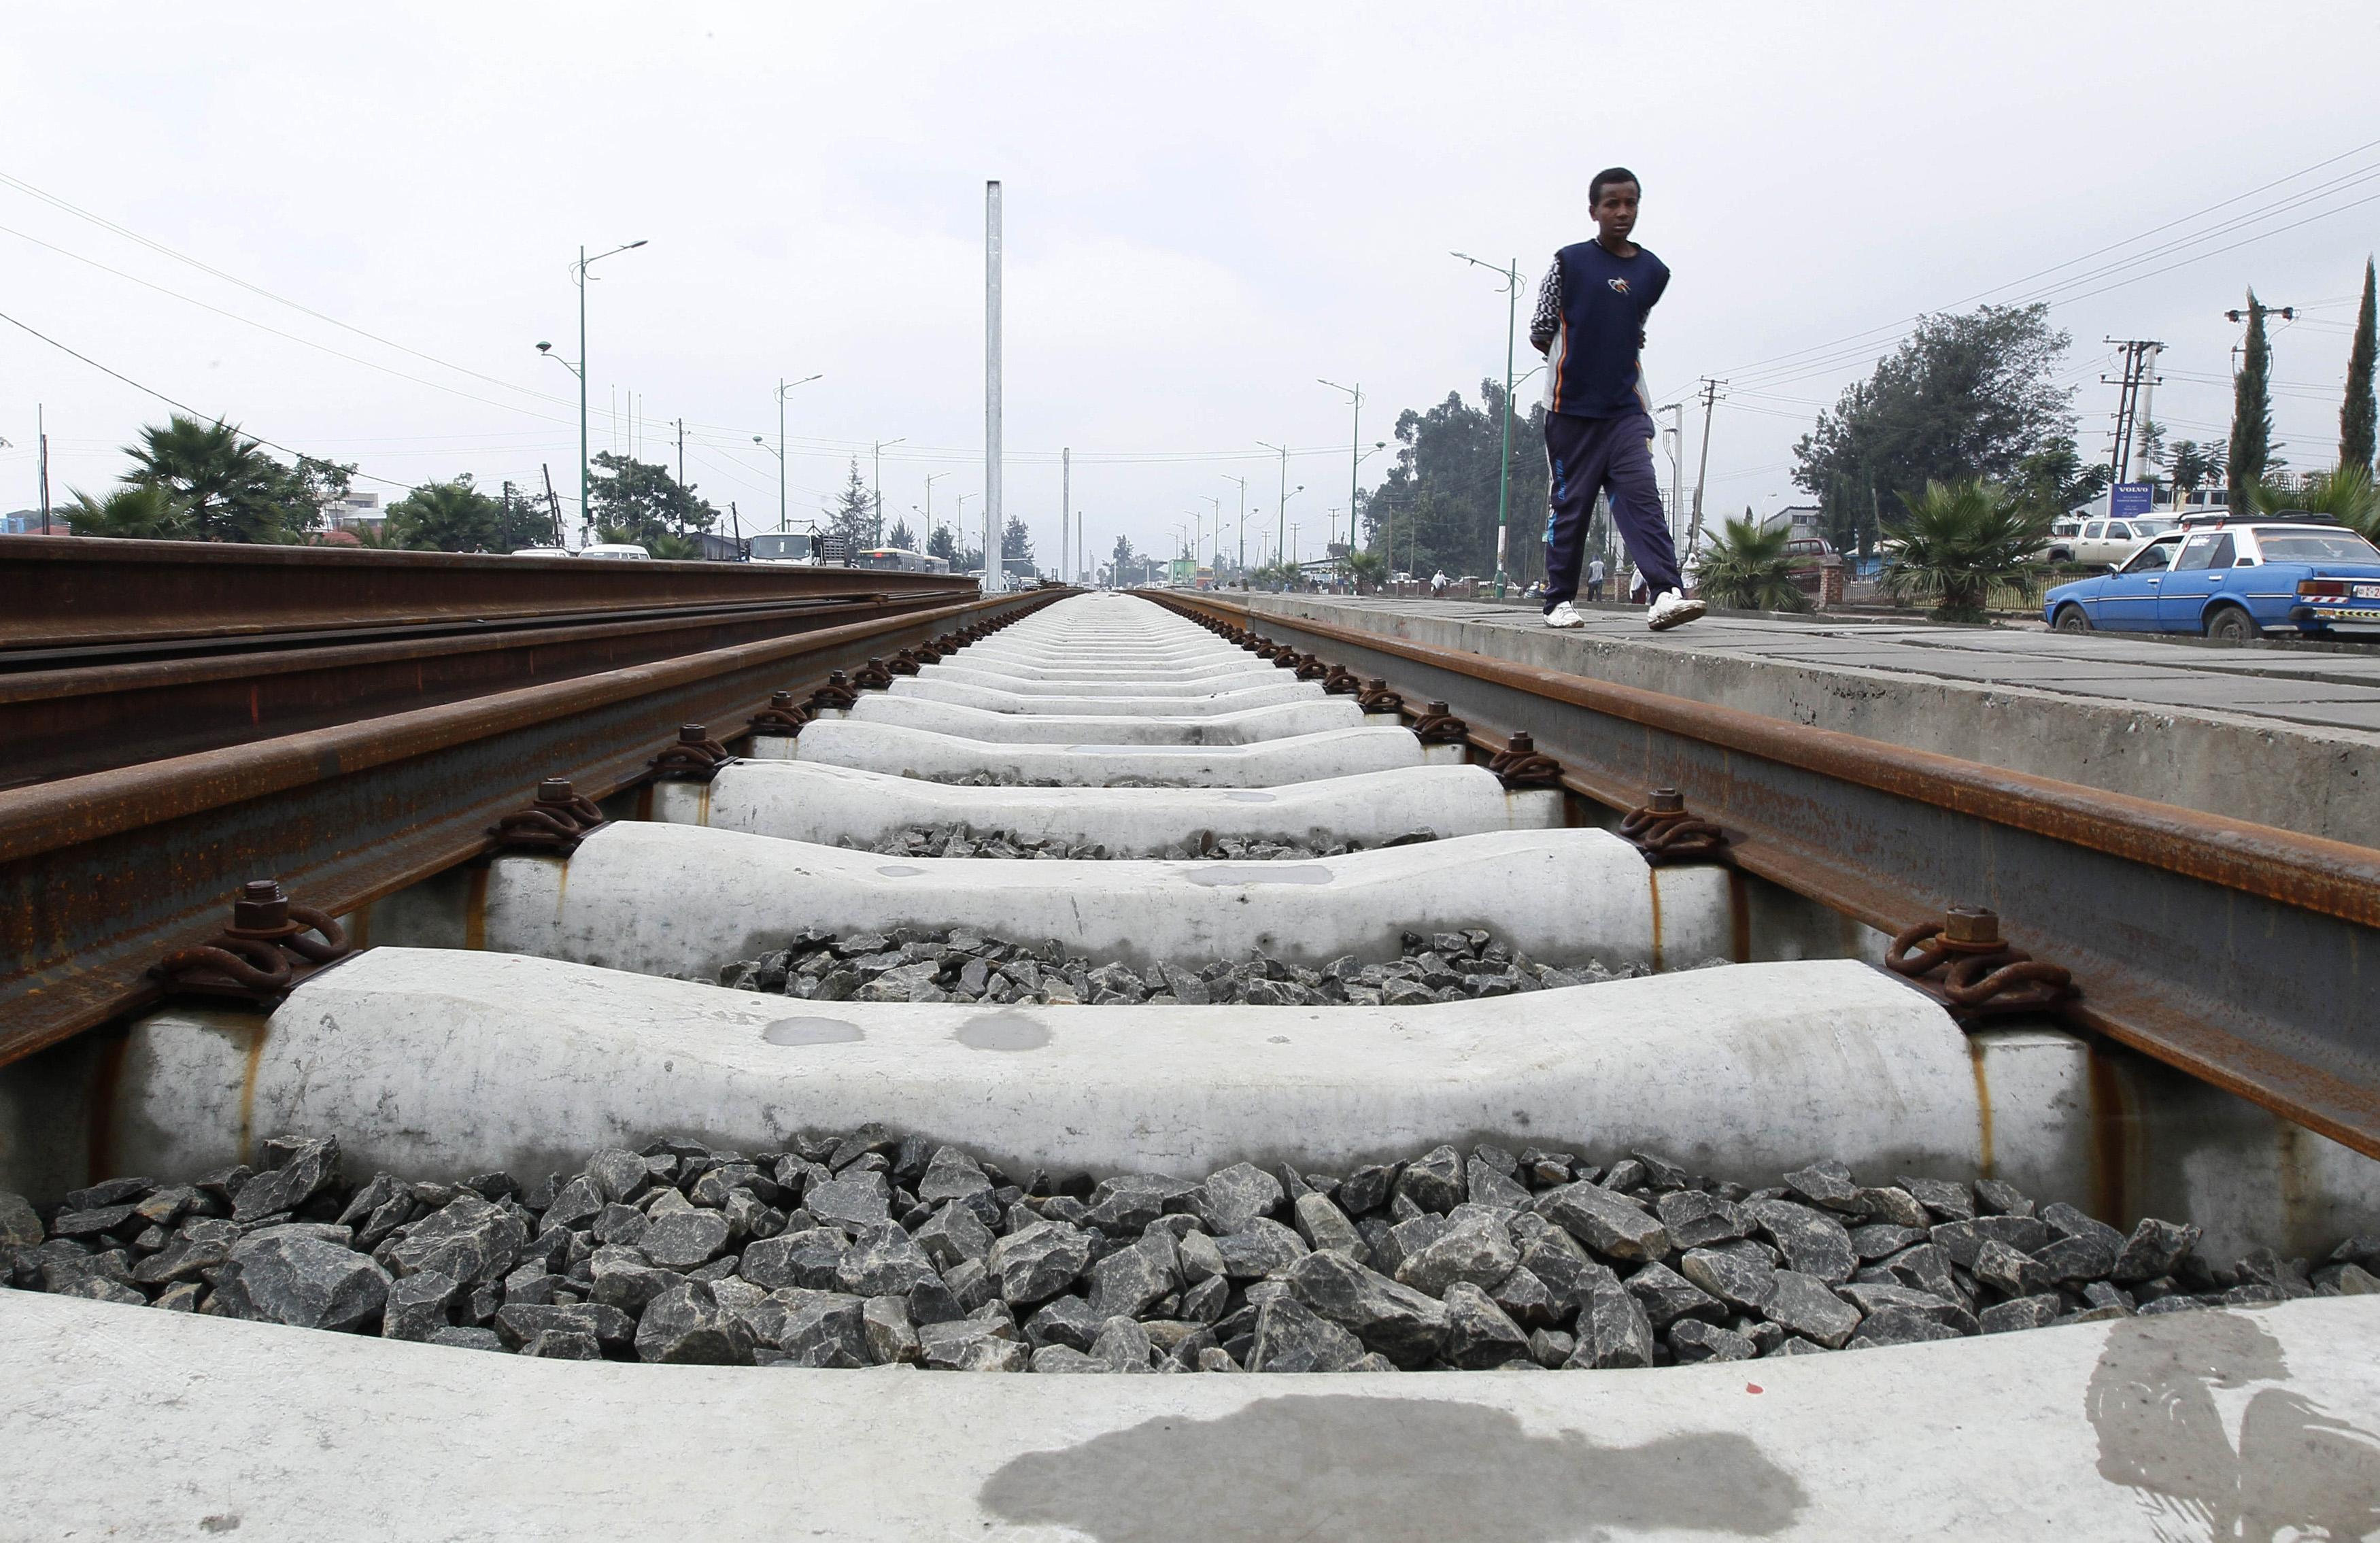 Africa in the news: Ethiopia-Djibouti railway complete, AU